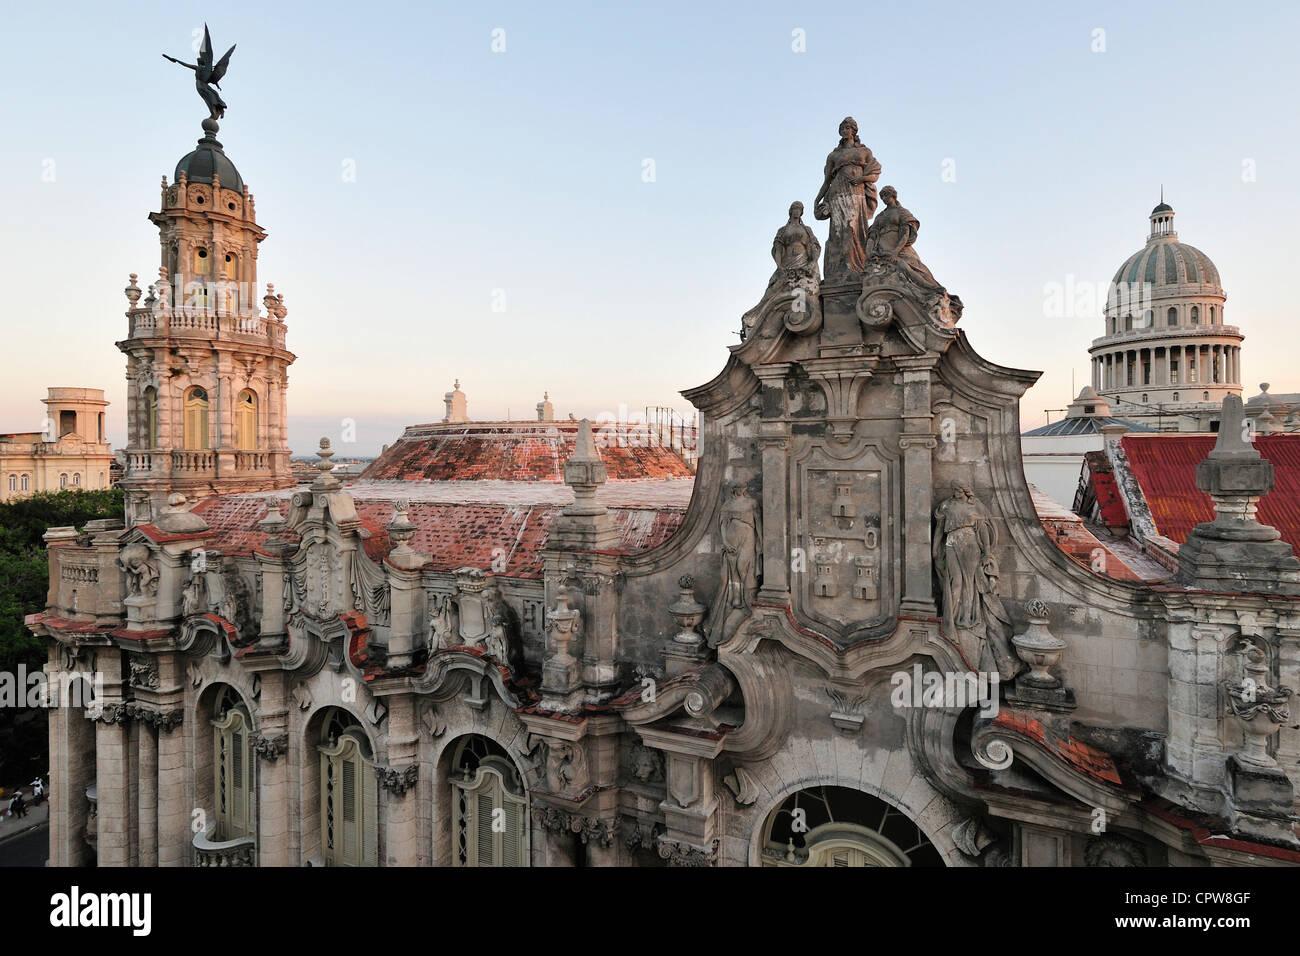 Havana. Cuba. View across the rooftop of the Gran Teatro de la Habana & the dome of the Capitolio (right). - Stock Image